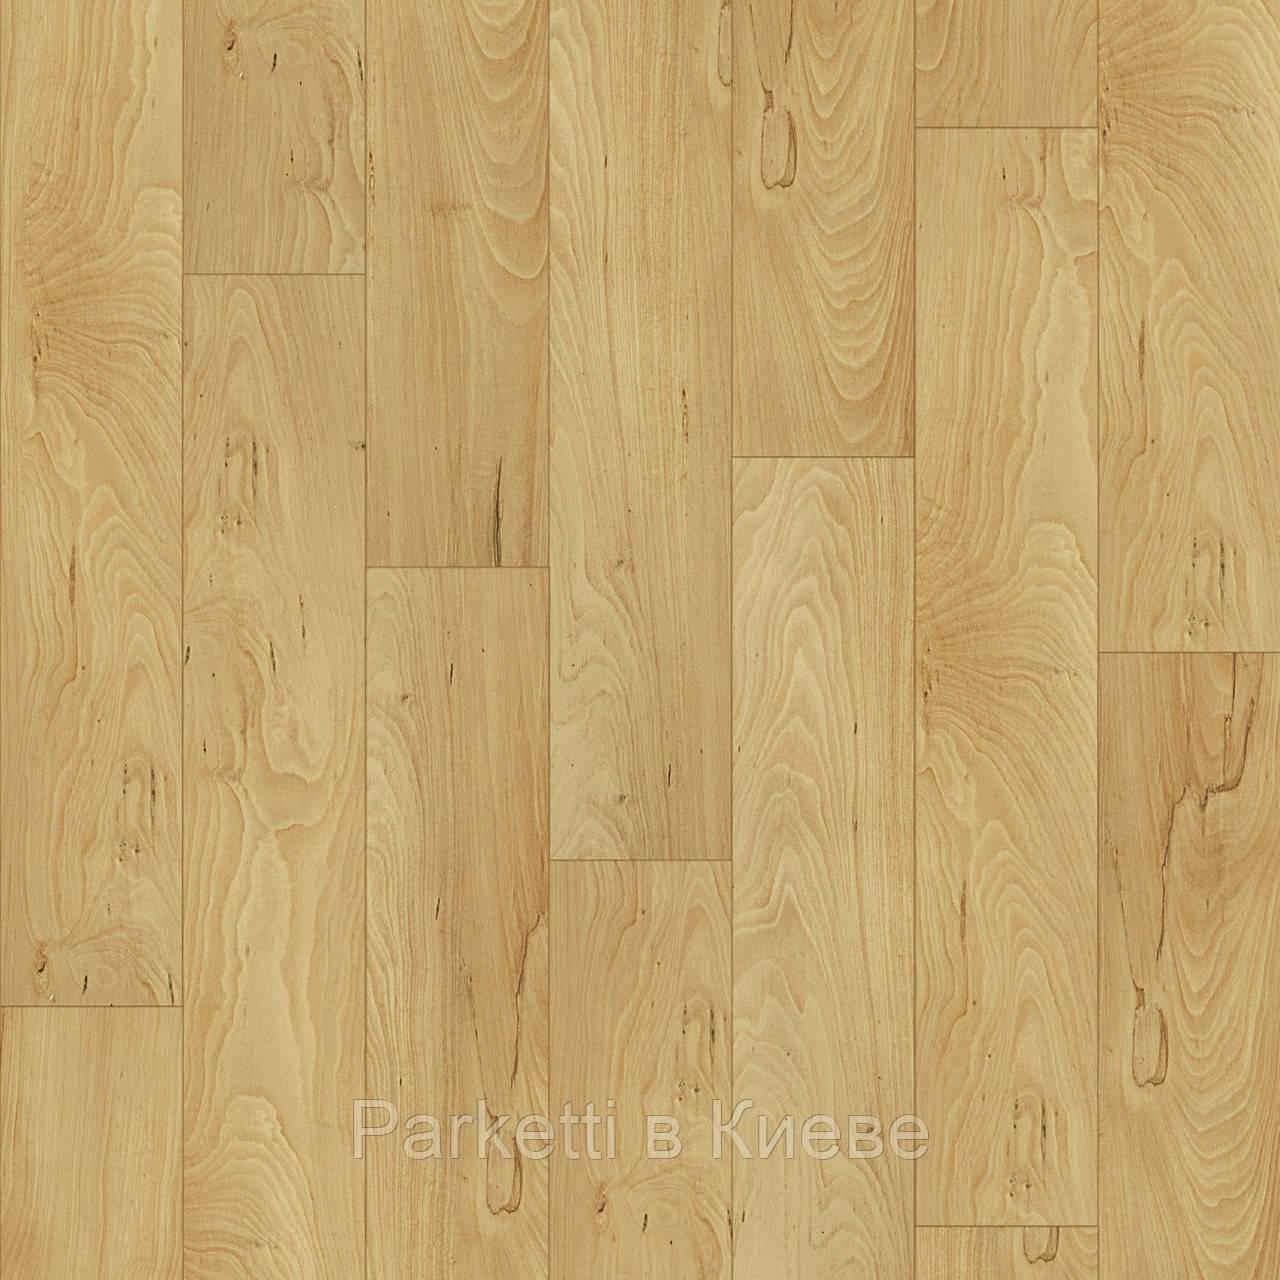 DLW 24076-165 Rustic Beech natural виниловая плитка Scala 40